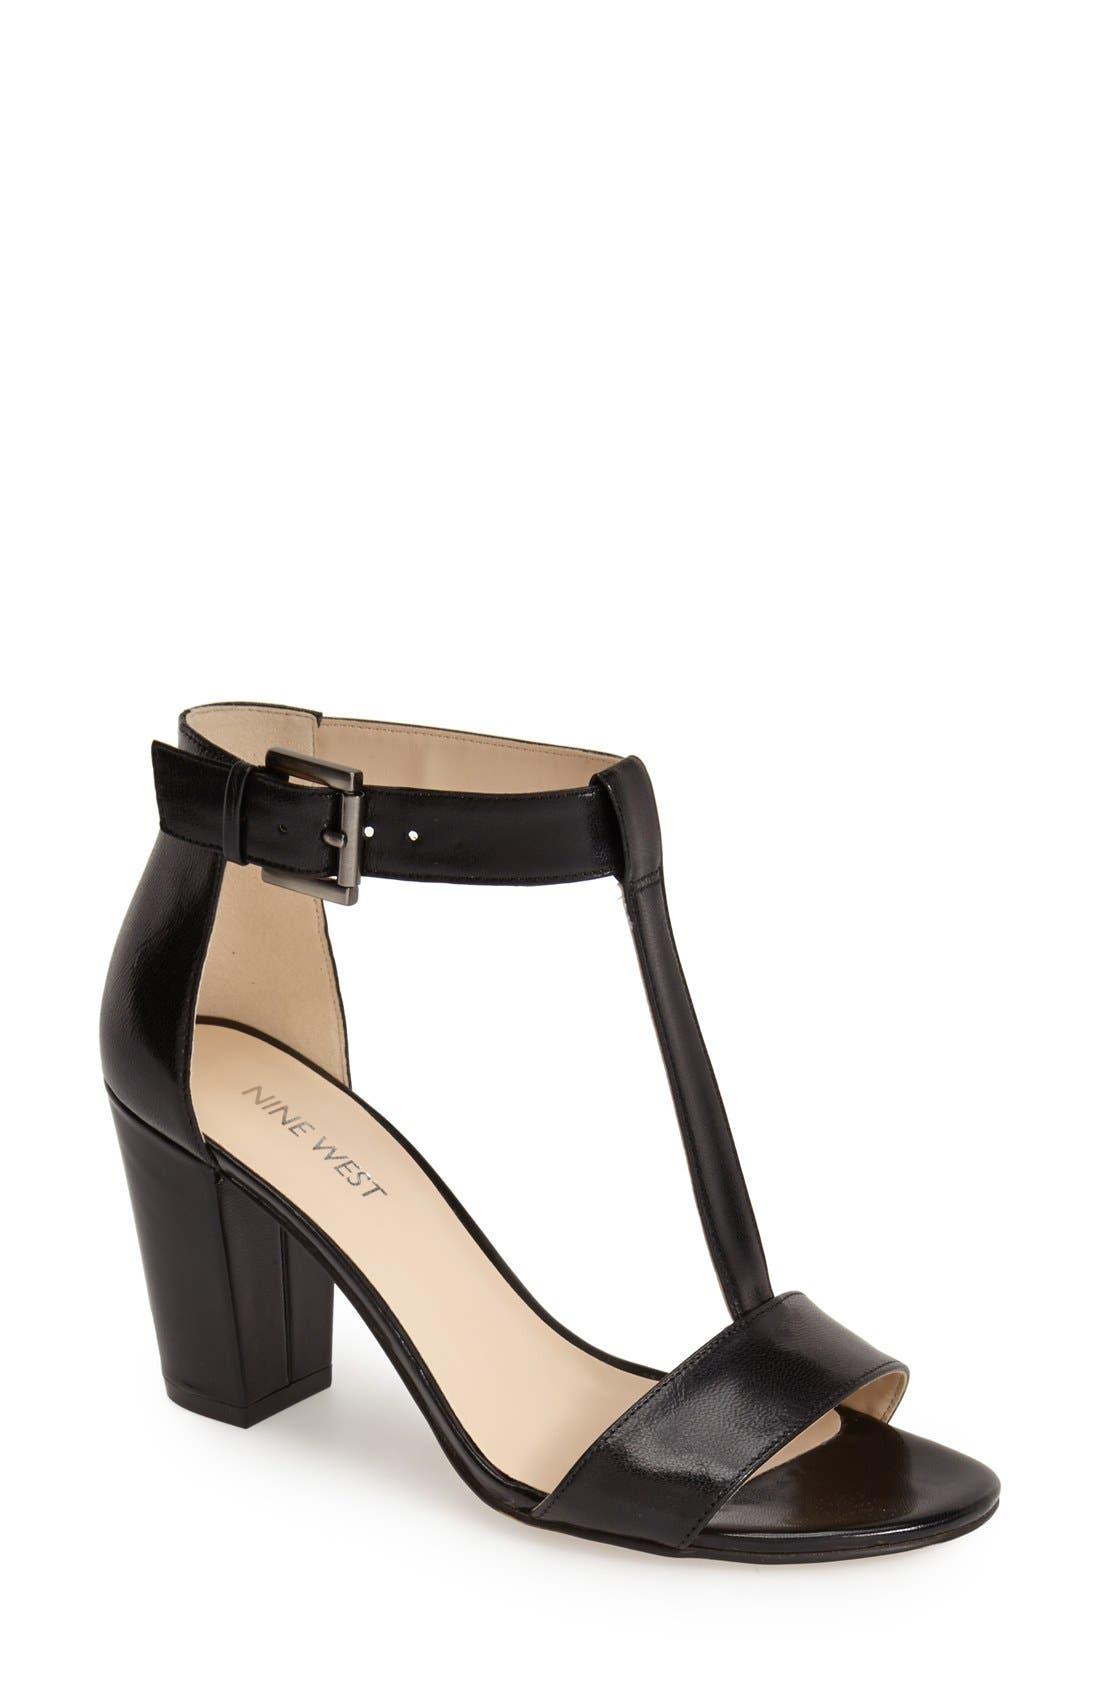 Main Image - Nine West 'Brannah' T-Strap Sandal (Women)